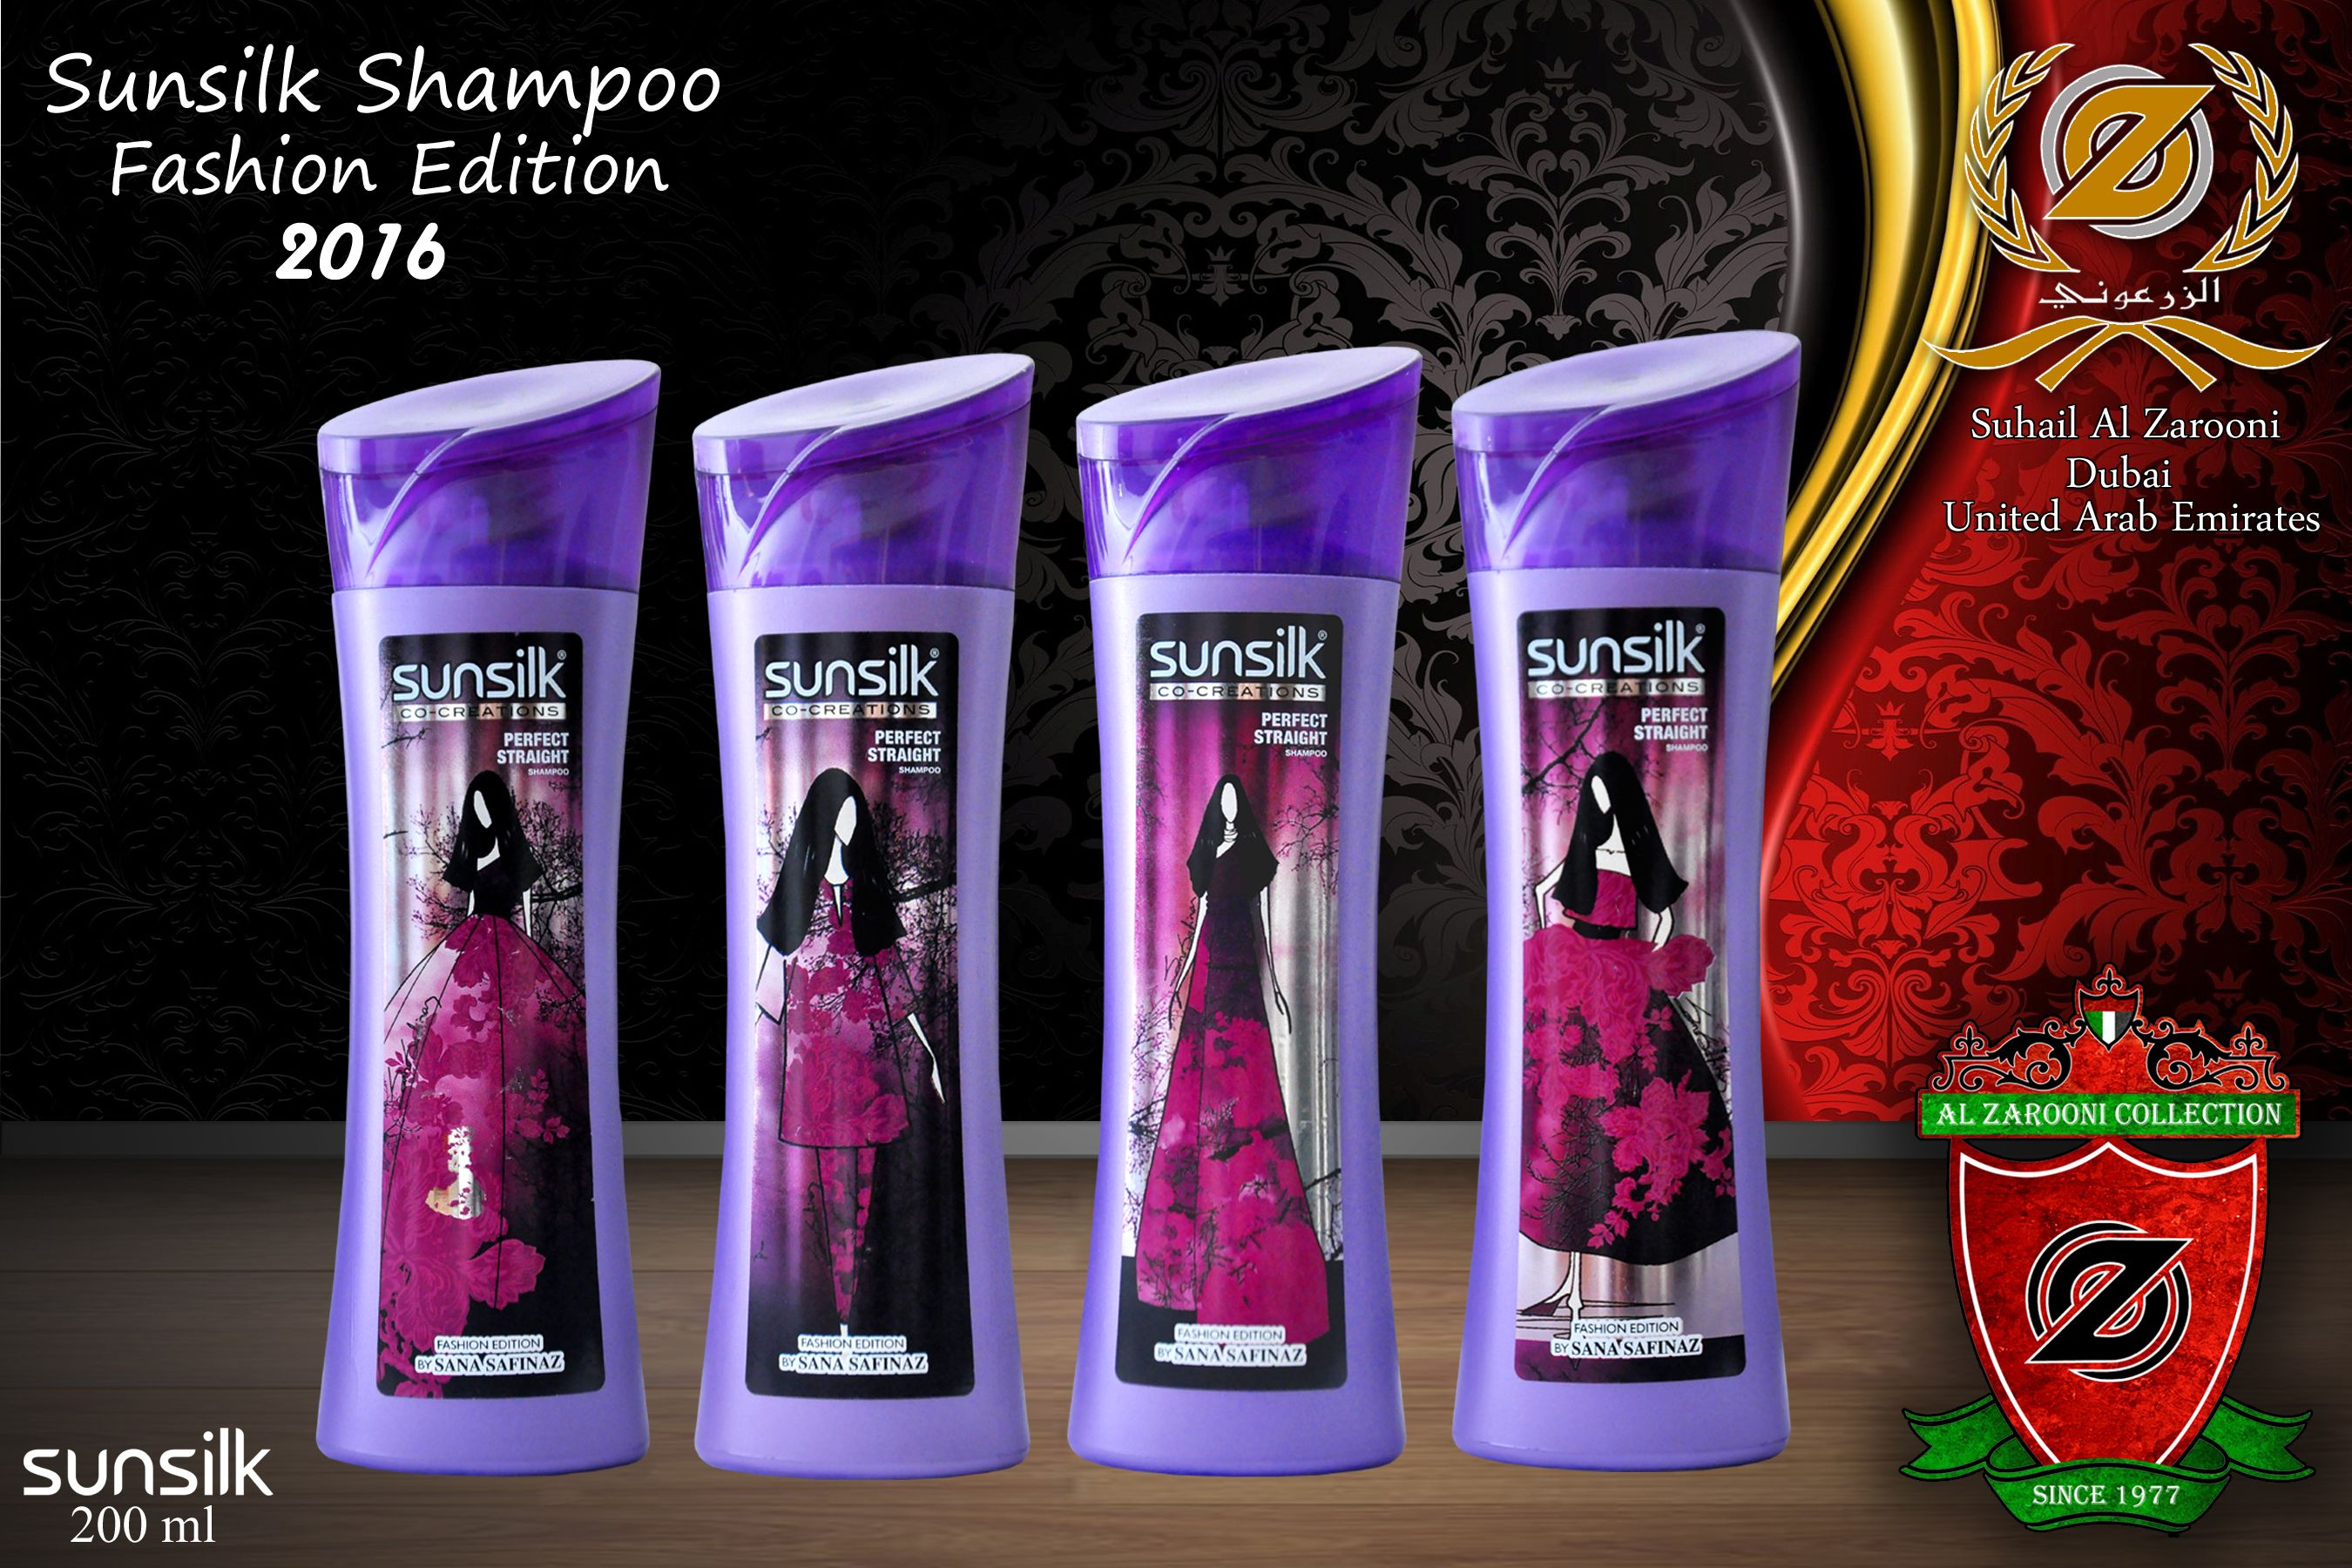 Sunsilk Shampoo Unilever Brand Hair Care Perfect Straight